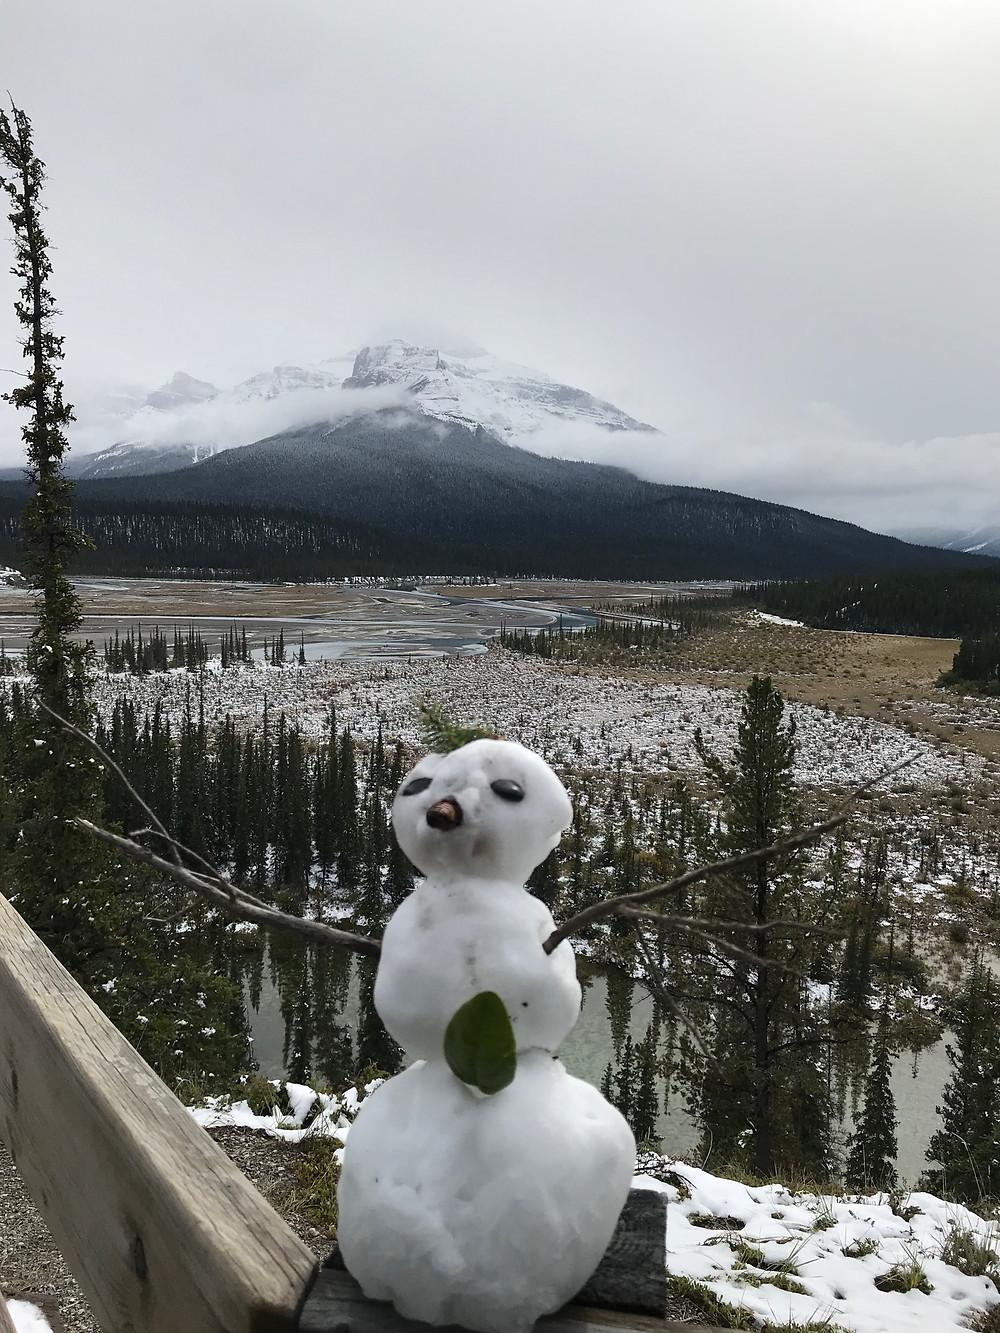 SNOWMAN, X-RATED SNOWMAN